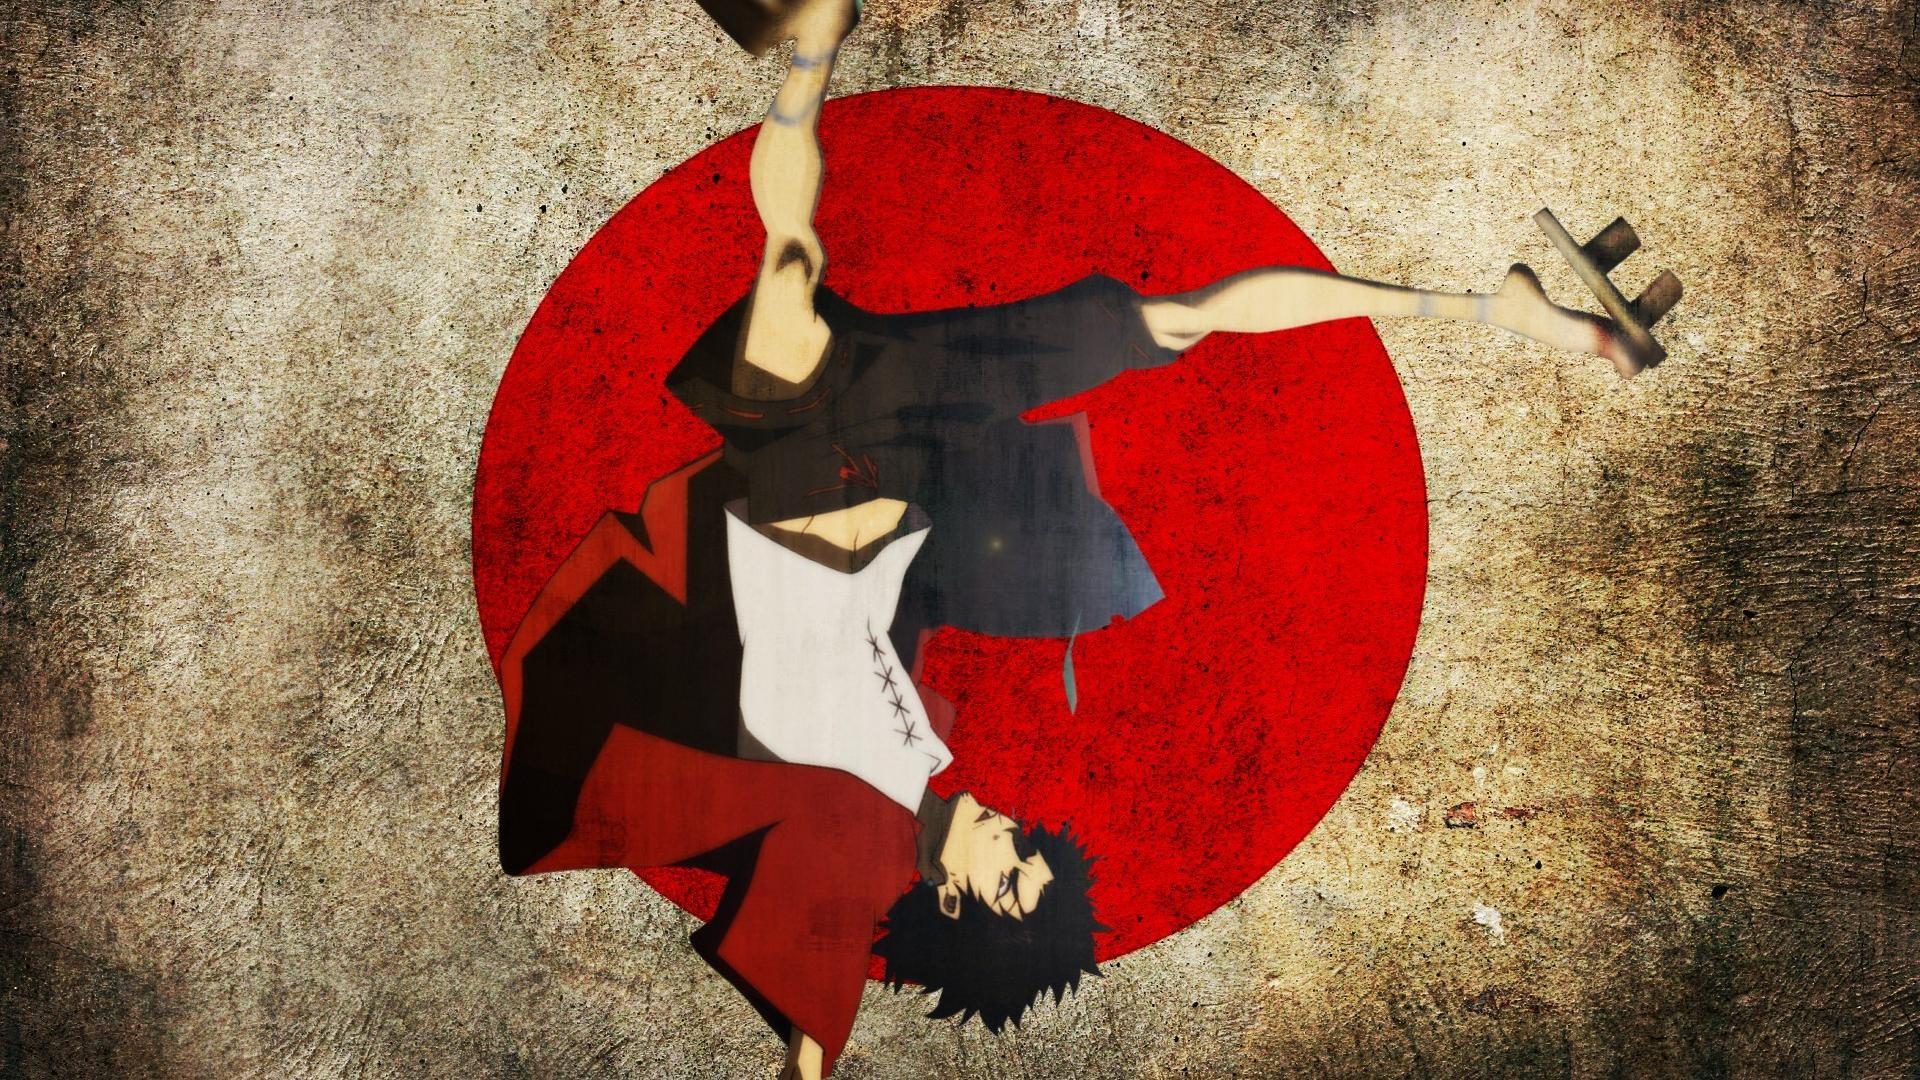 108+ Samurai Champloo Wallpaper HD